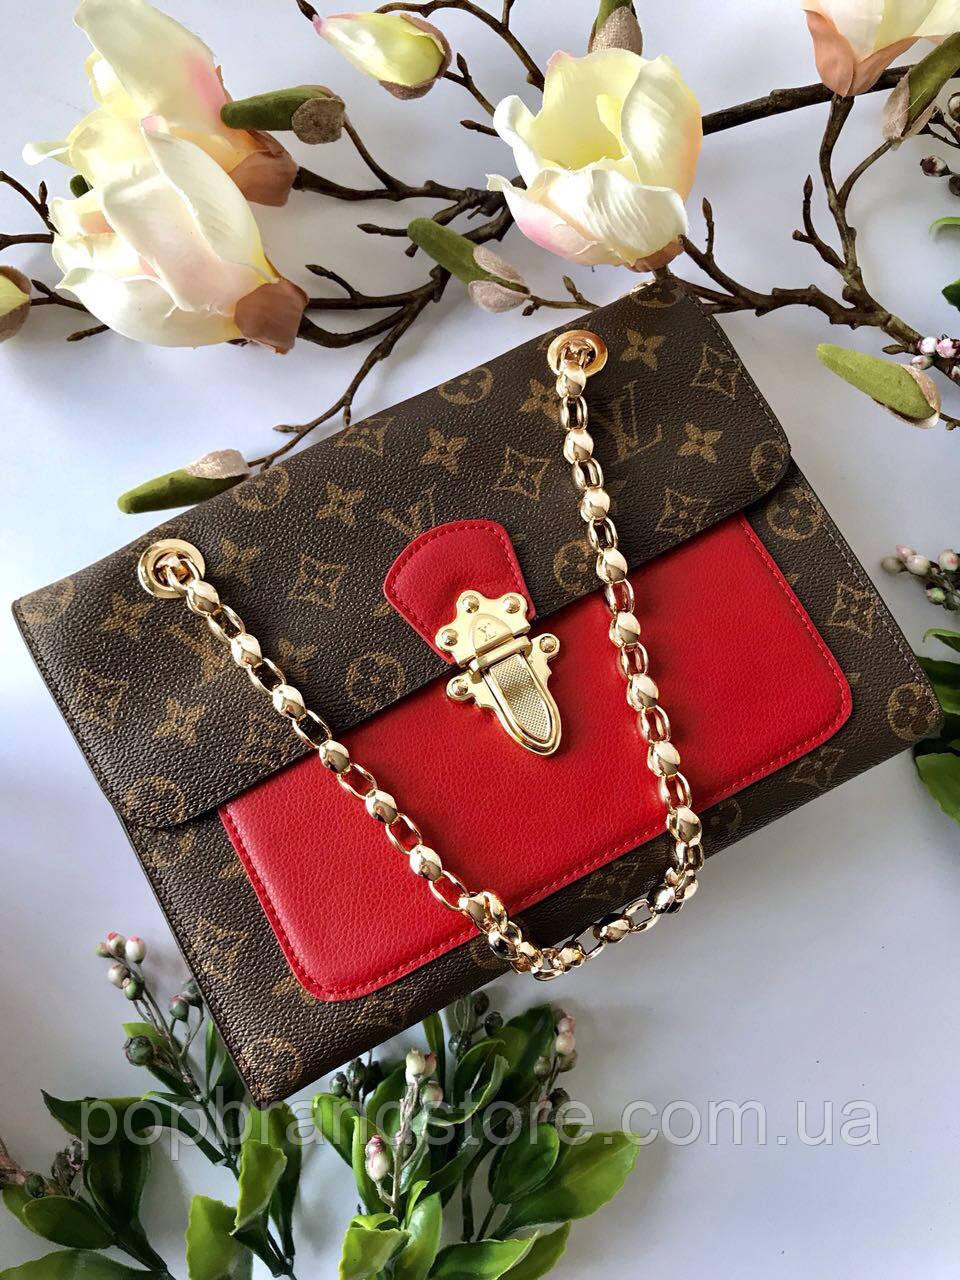 4e84153983ad Женская сумочка LOUIS VUITTON Victoire (реплика) - Pop Brand Store    брендовые сумки,